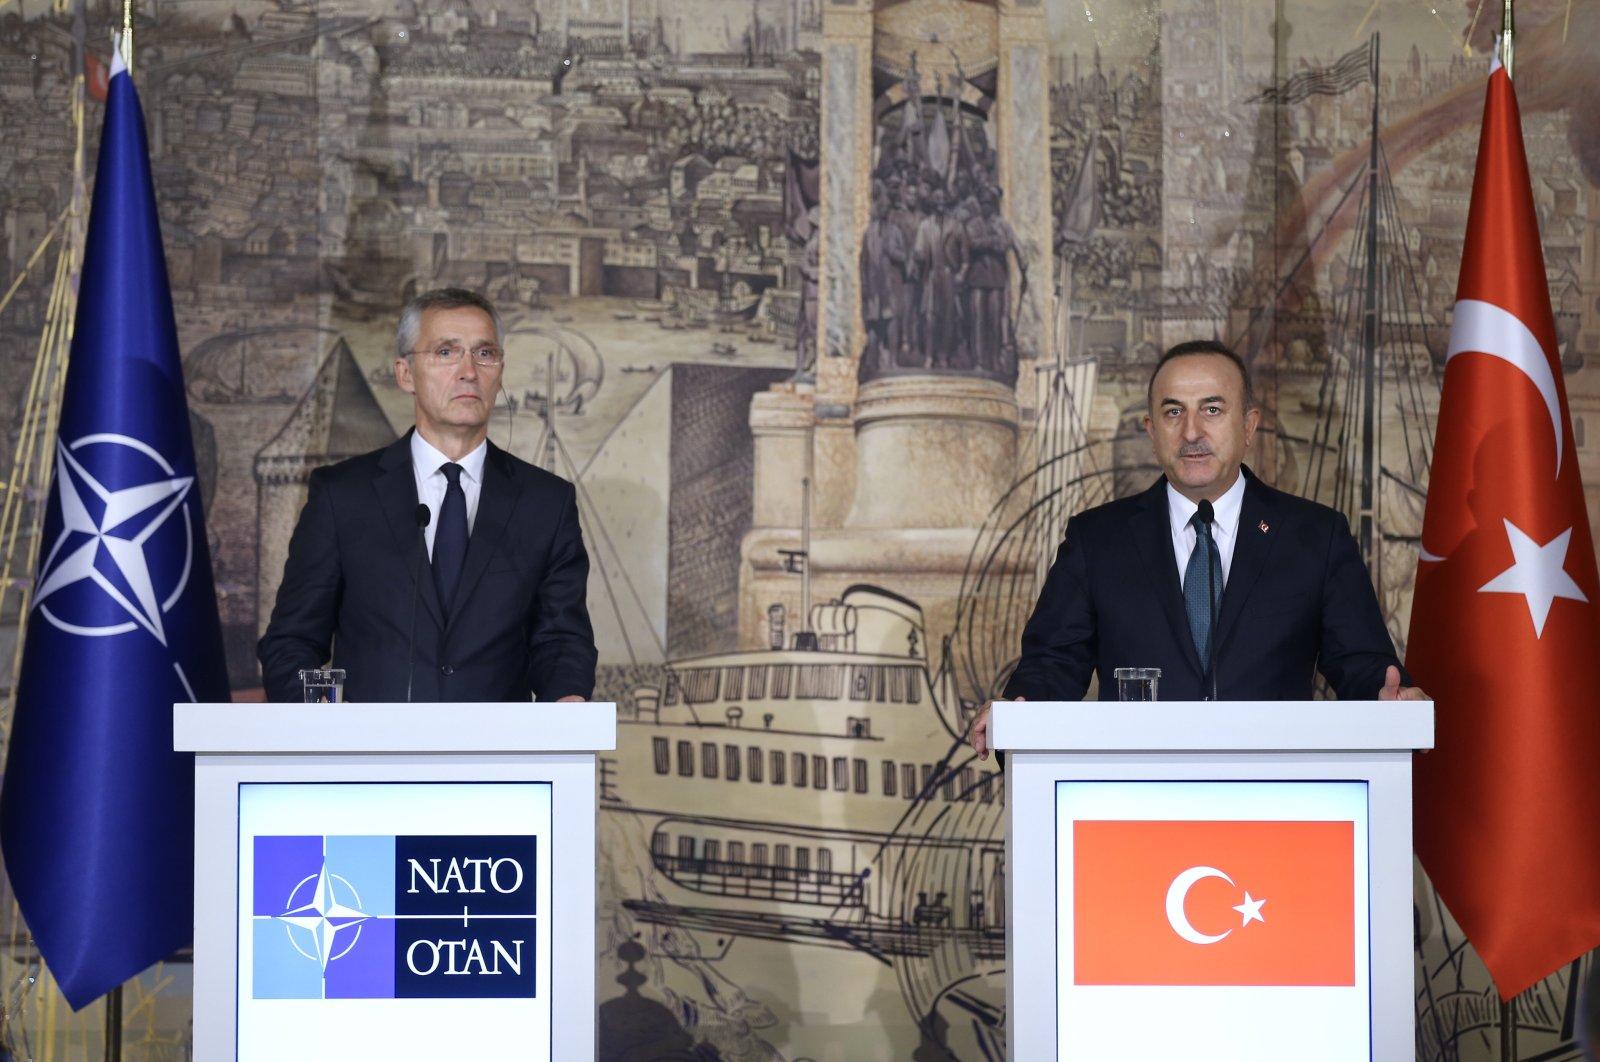 Turkey's Foreign Minister Mevlüt Çavuşoğlu and NATO Secretary-General Jens Stoltenberg in Dolmabahce Palace, Istanbul, Oct. 14, 2019. (AA Photo)